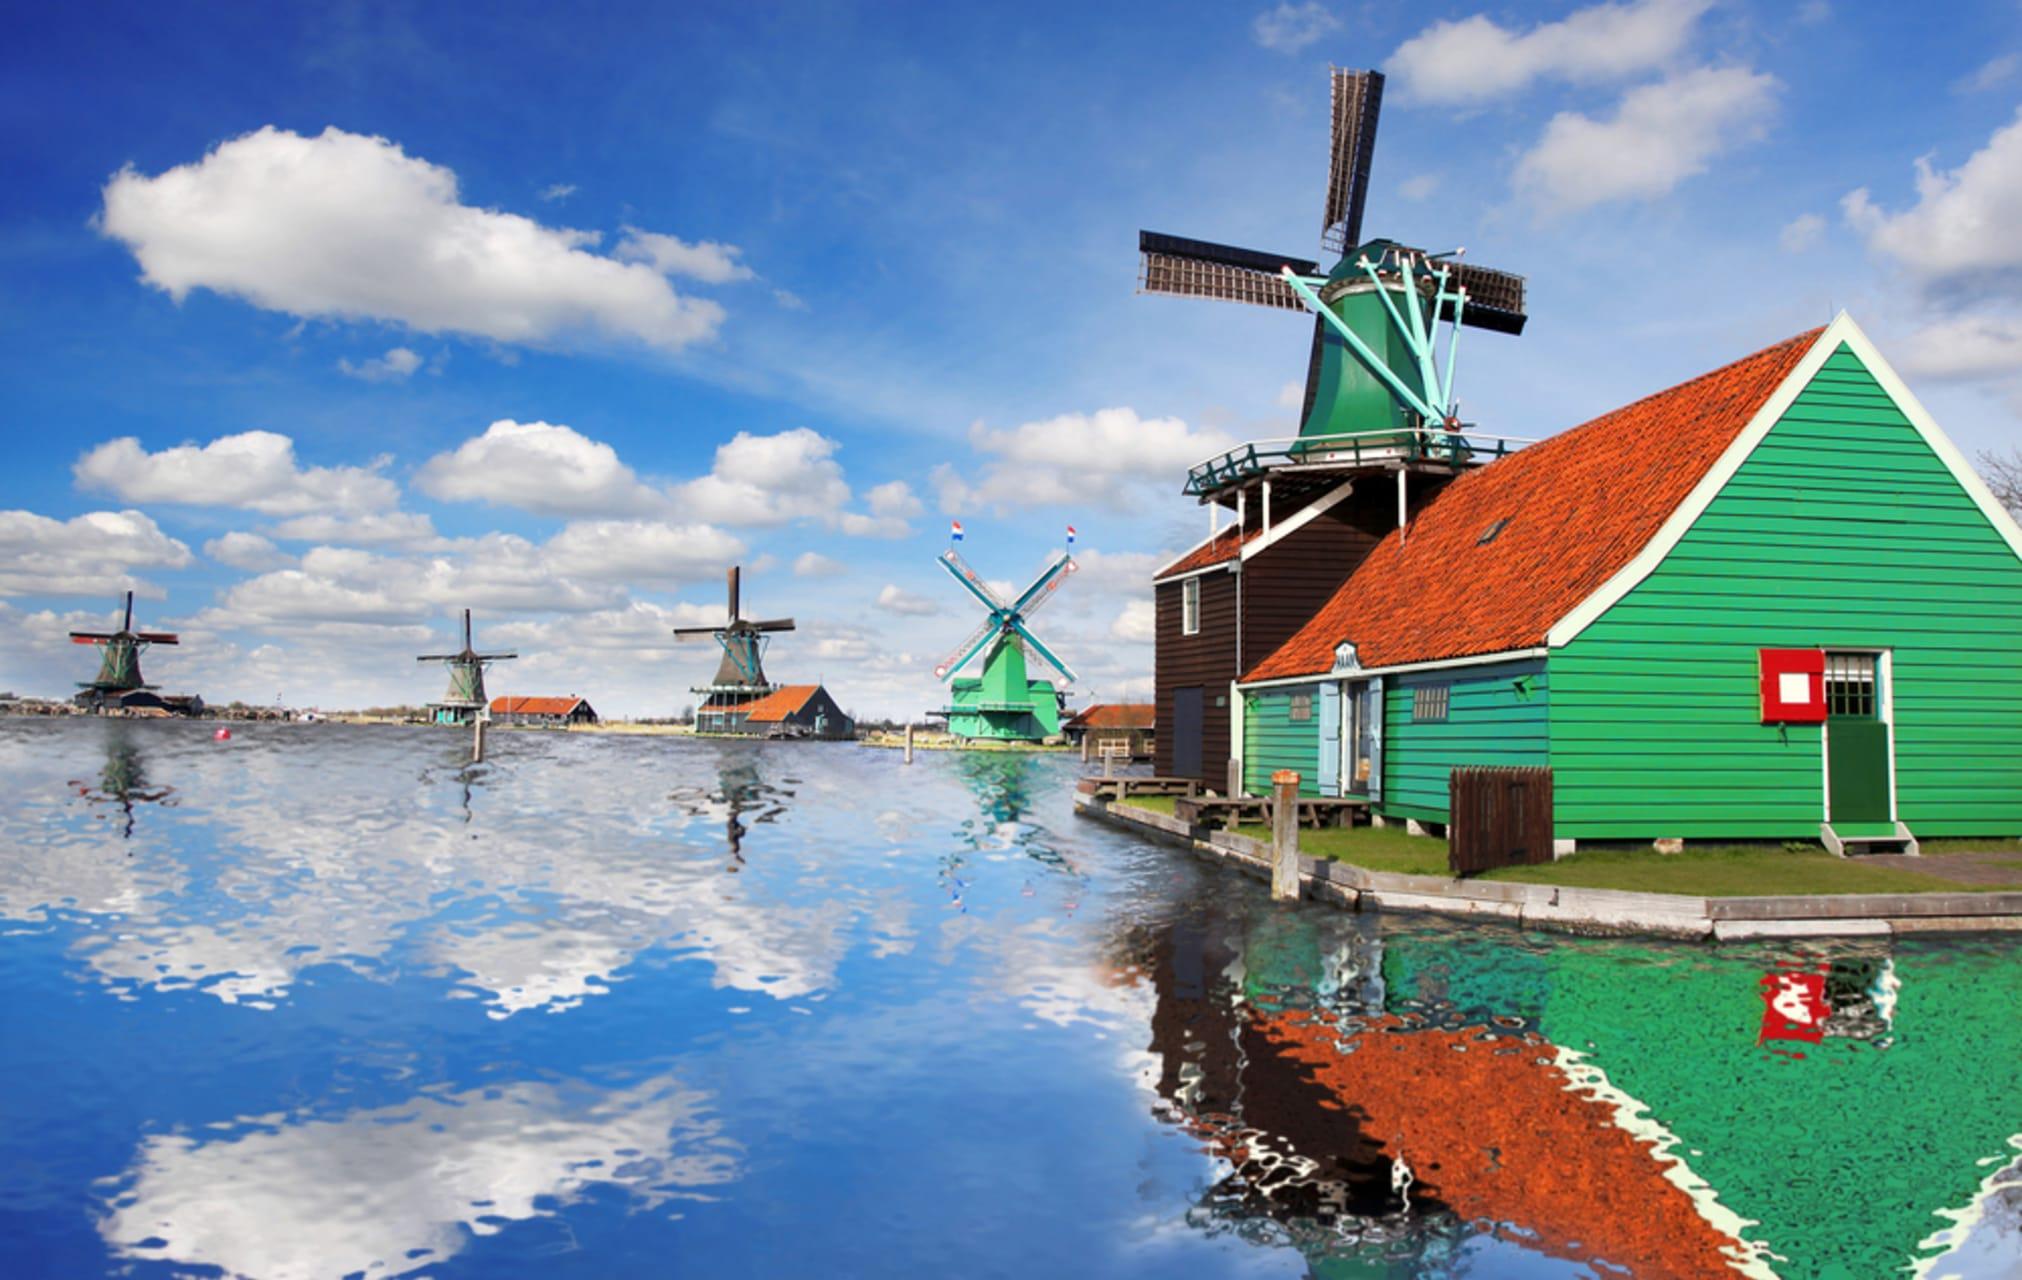 Amsterdam - Windmills & Clog Making at Zaanse Schans